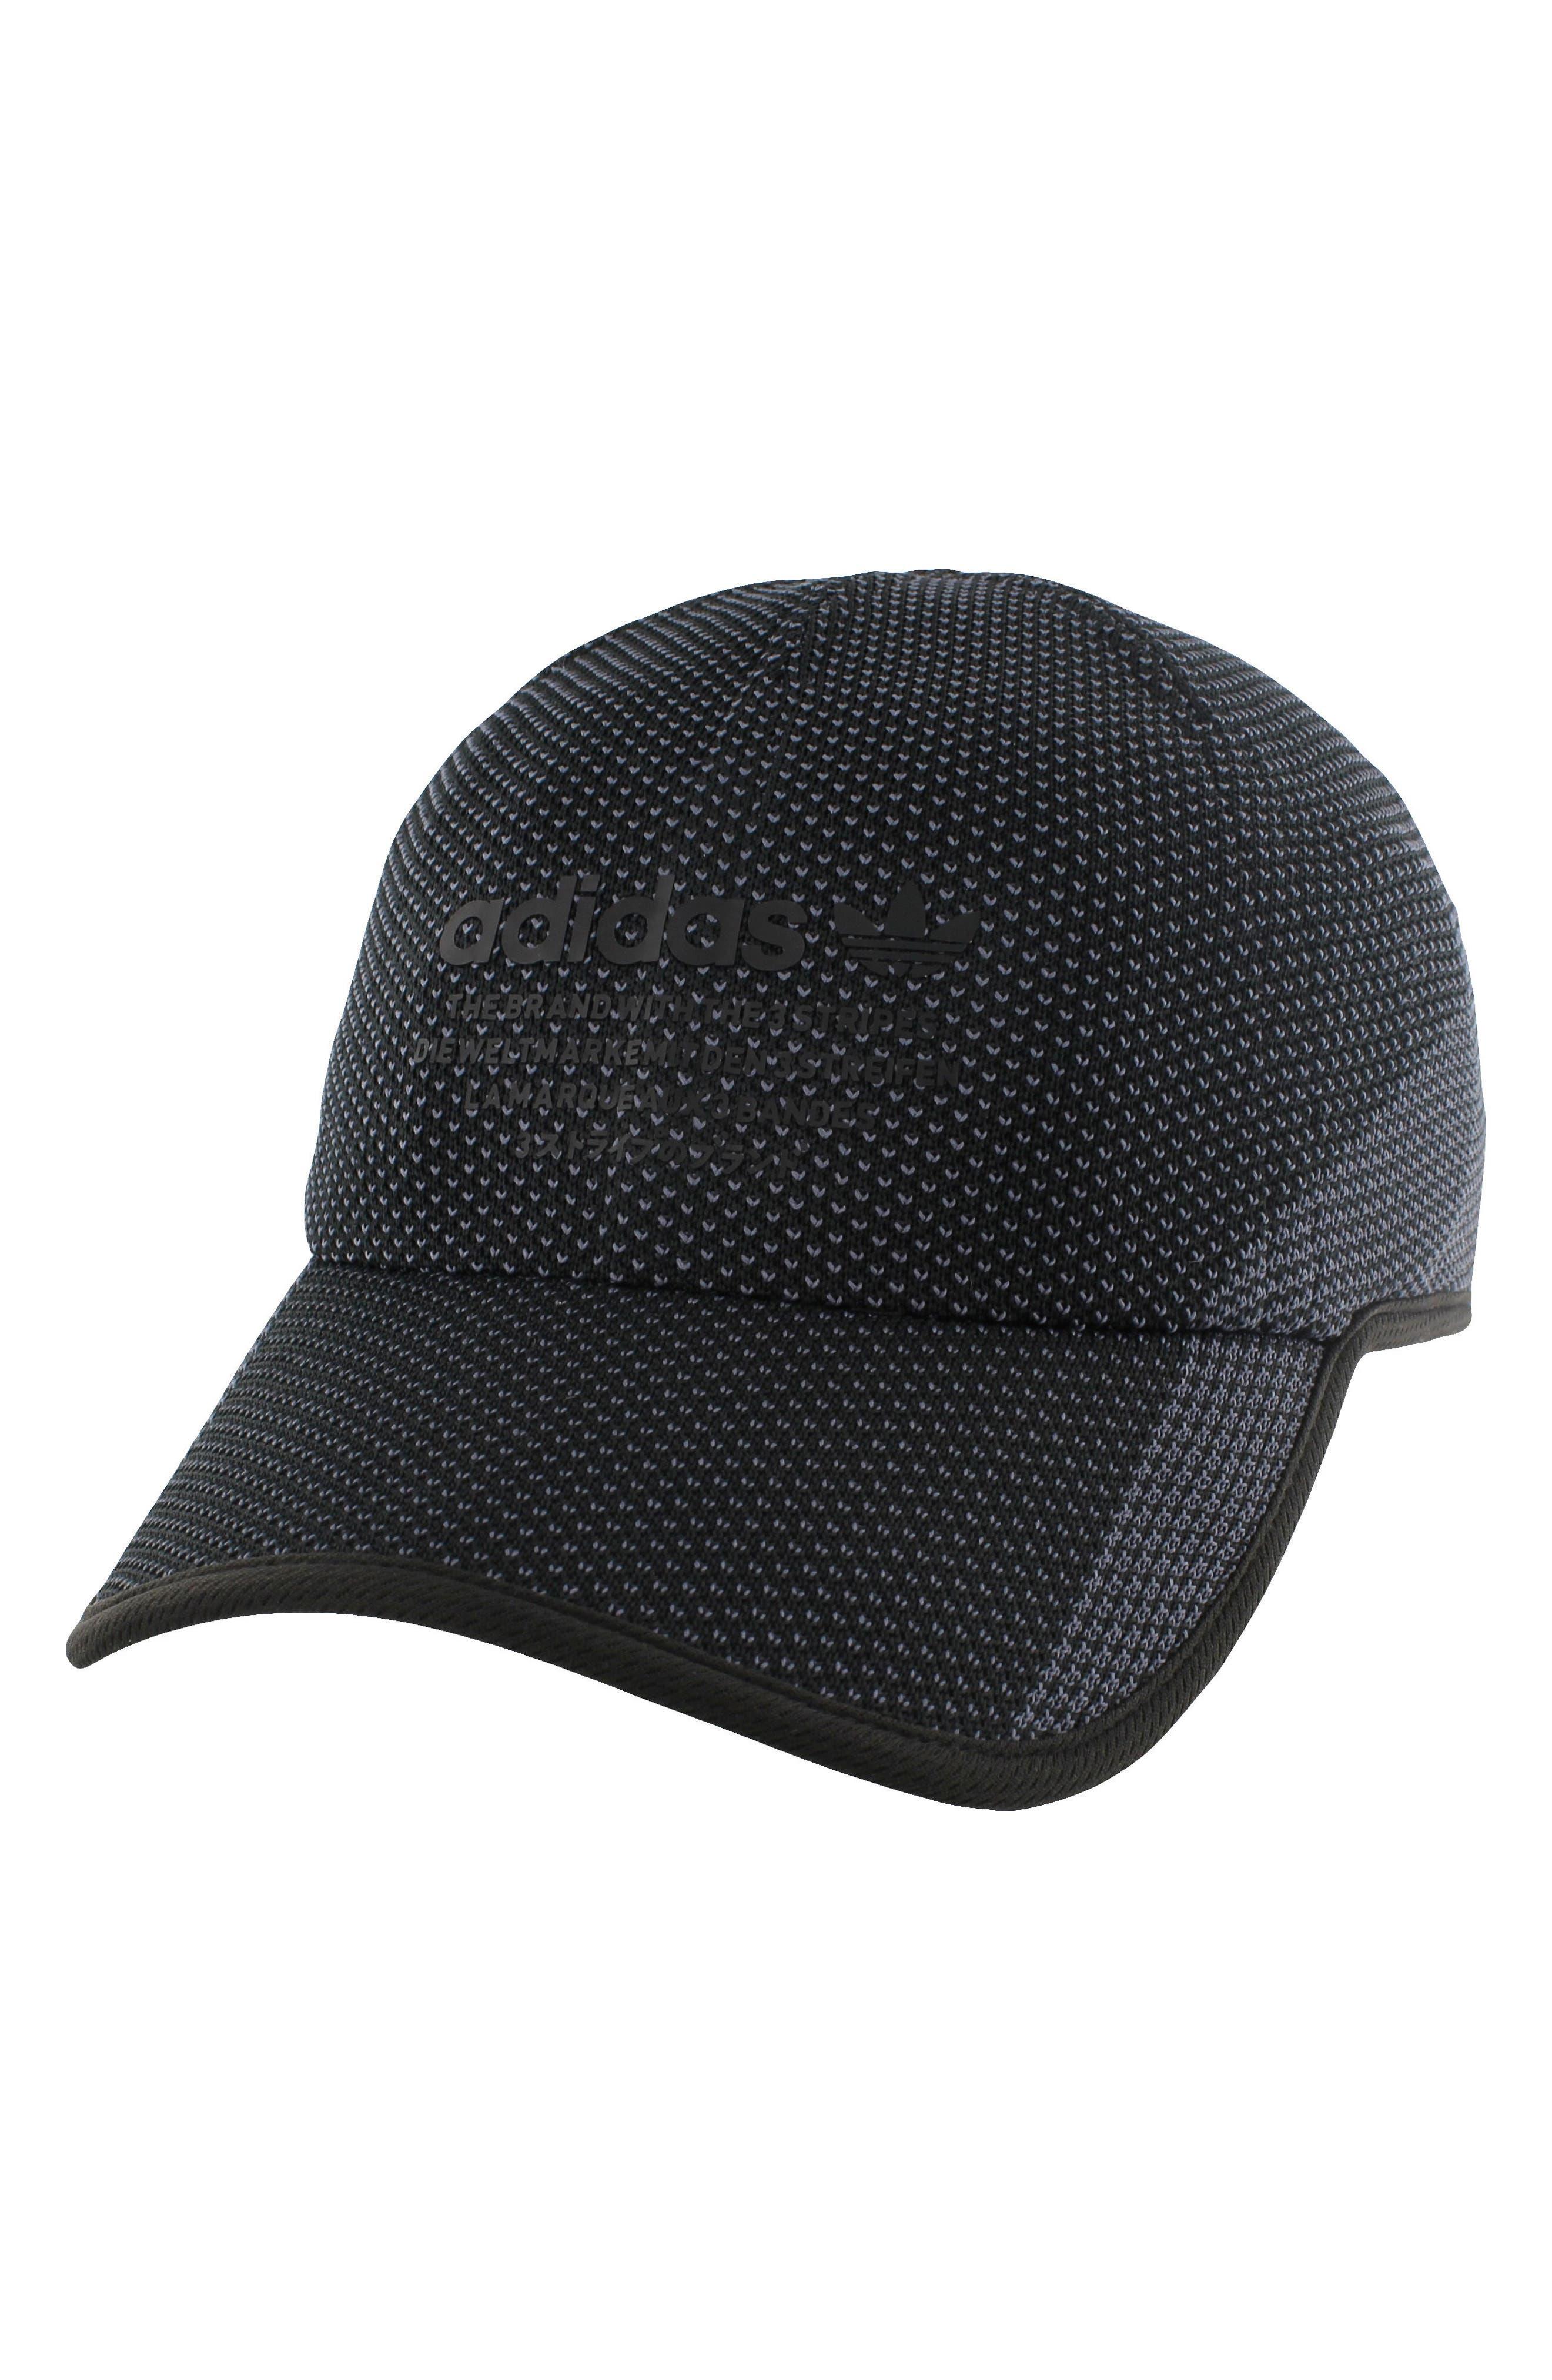 NMD Prime Ball Cap,                         Main,                         color, Black